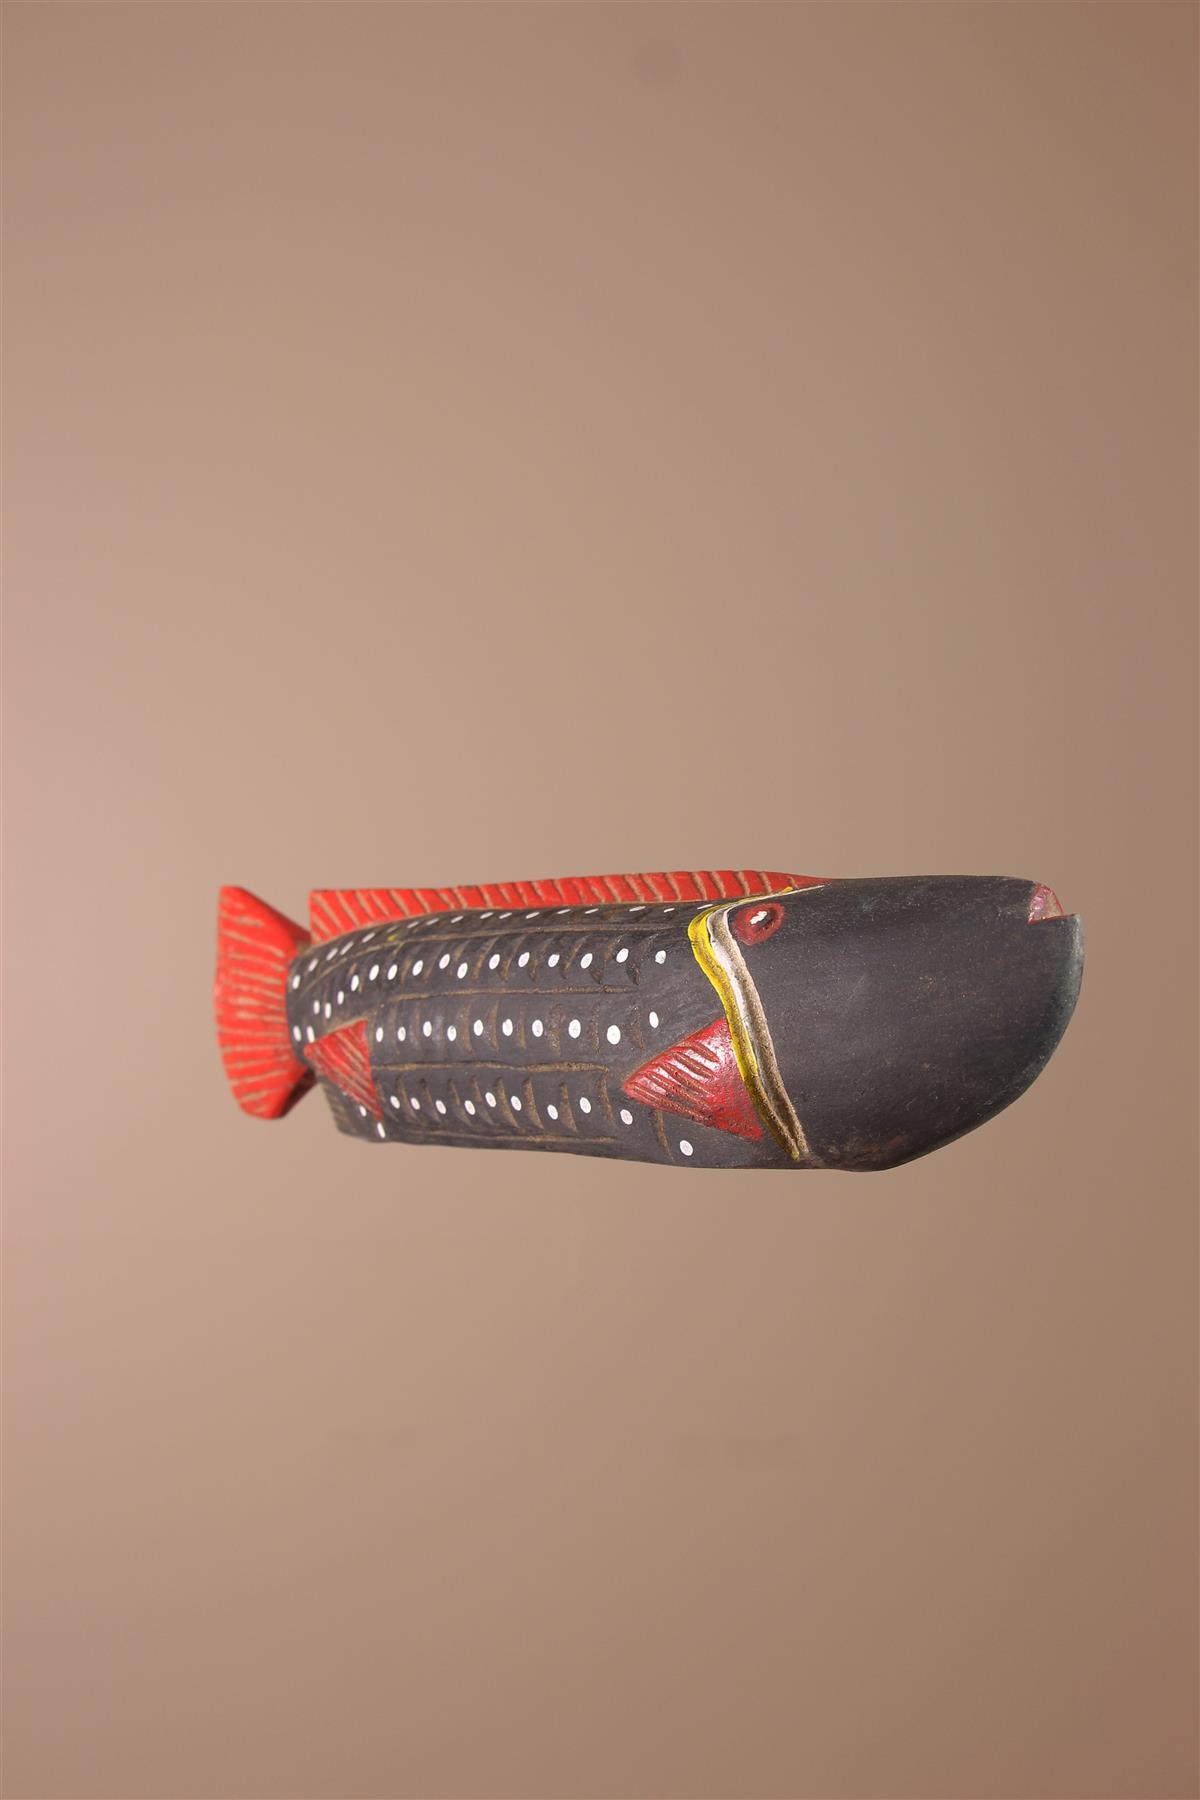 Poisson Bozo - Déco africaine - Art africain traditionnel